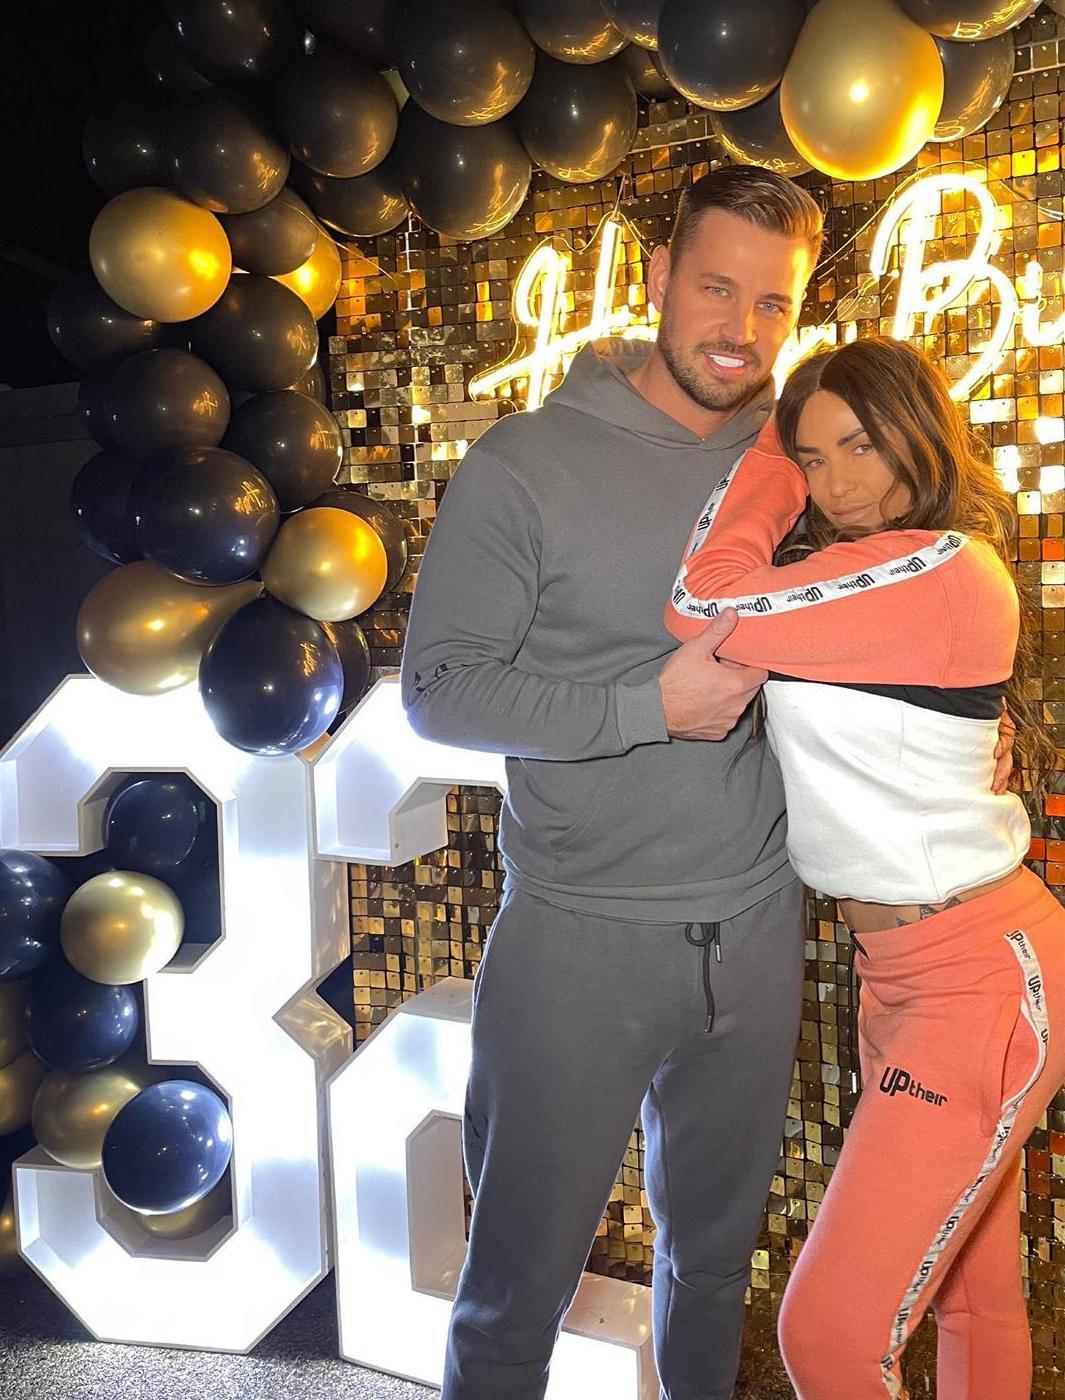 Katie Price wearing a peach Uptheir tracksuit hugging boyfriend Karl Woods in a grey tracksuit